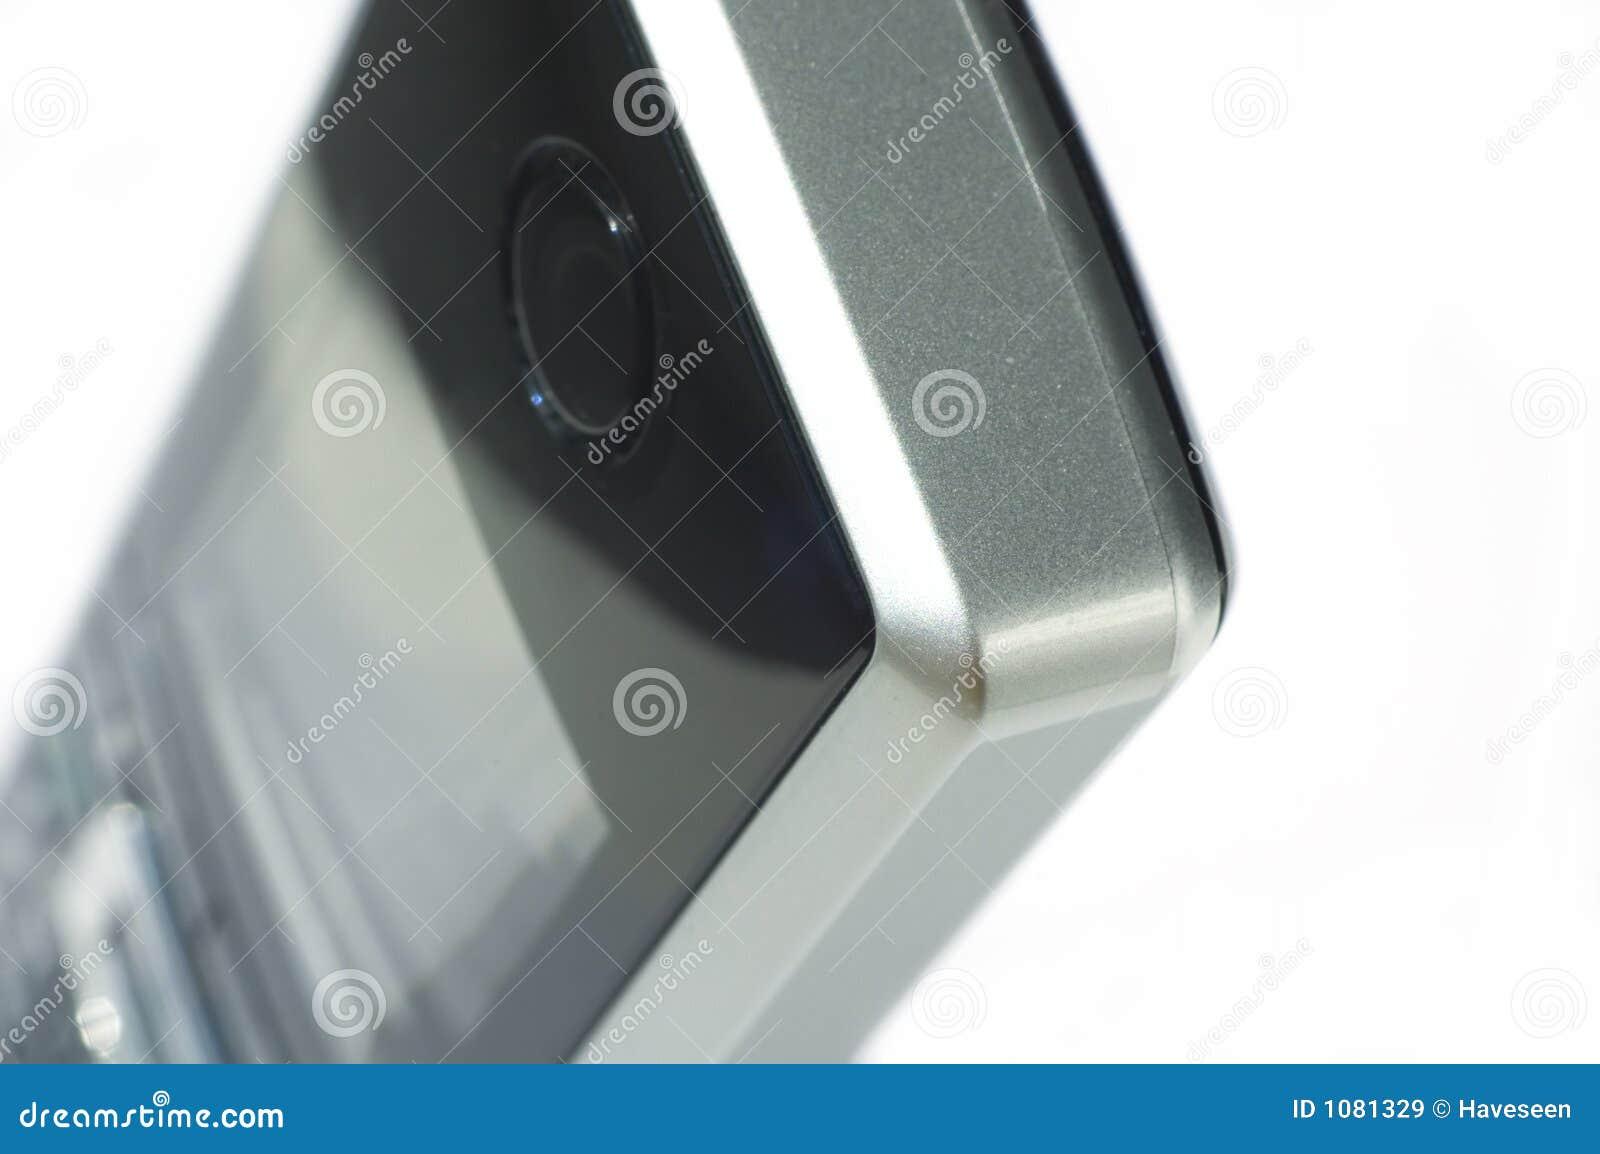 Modernes DECT-Telefon